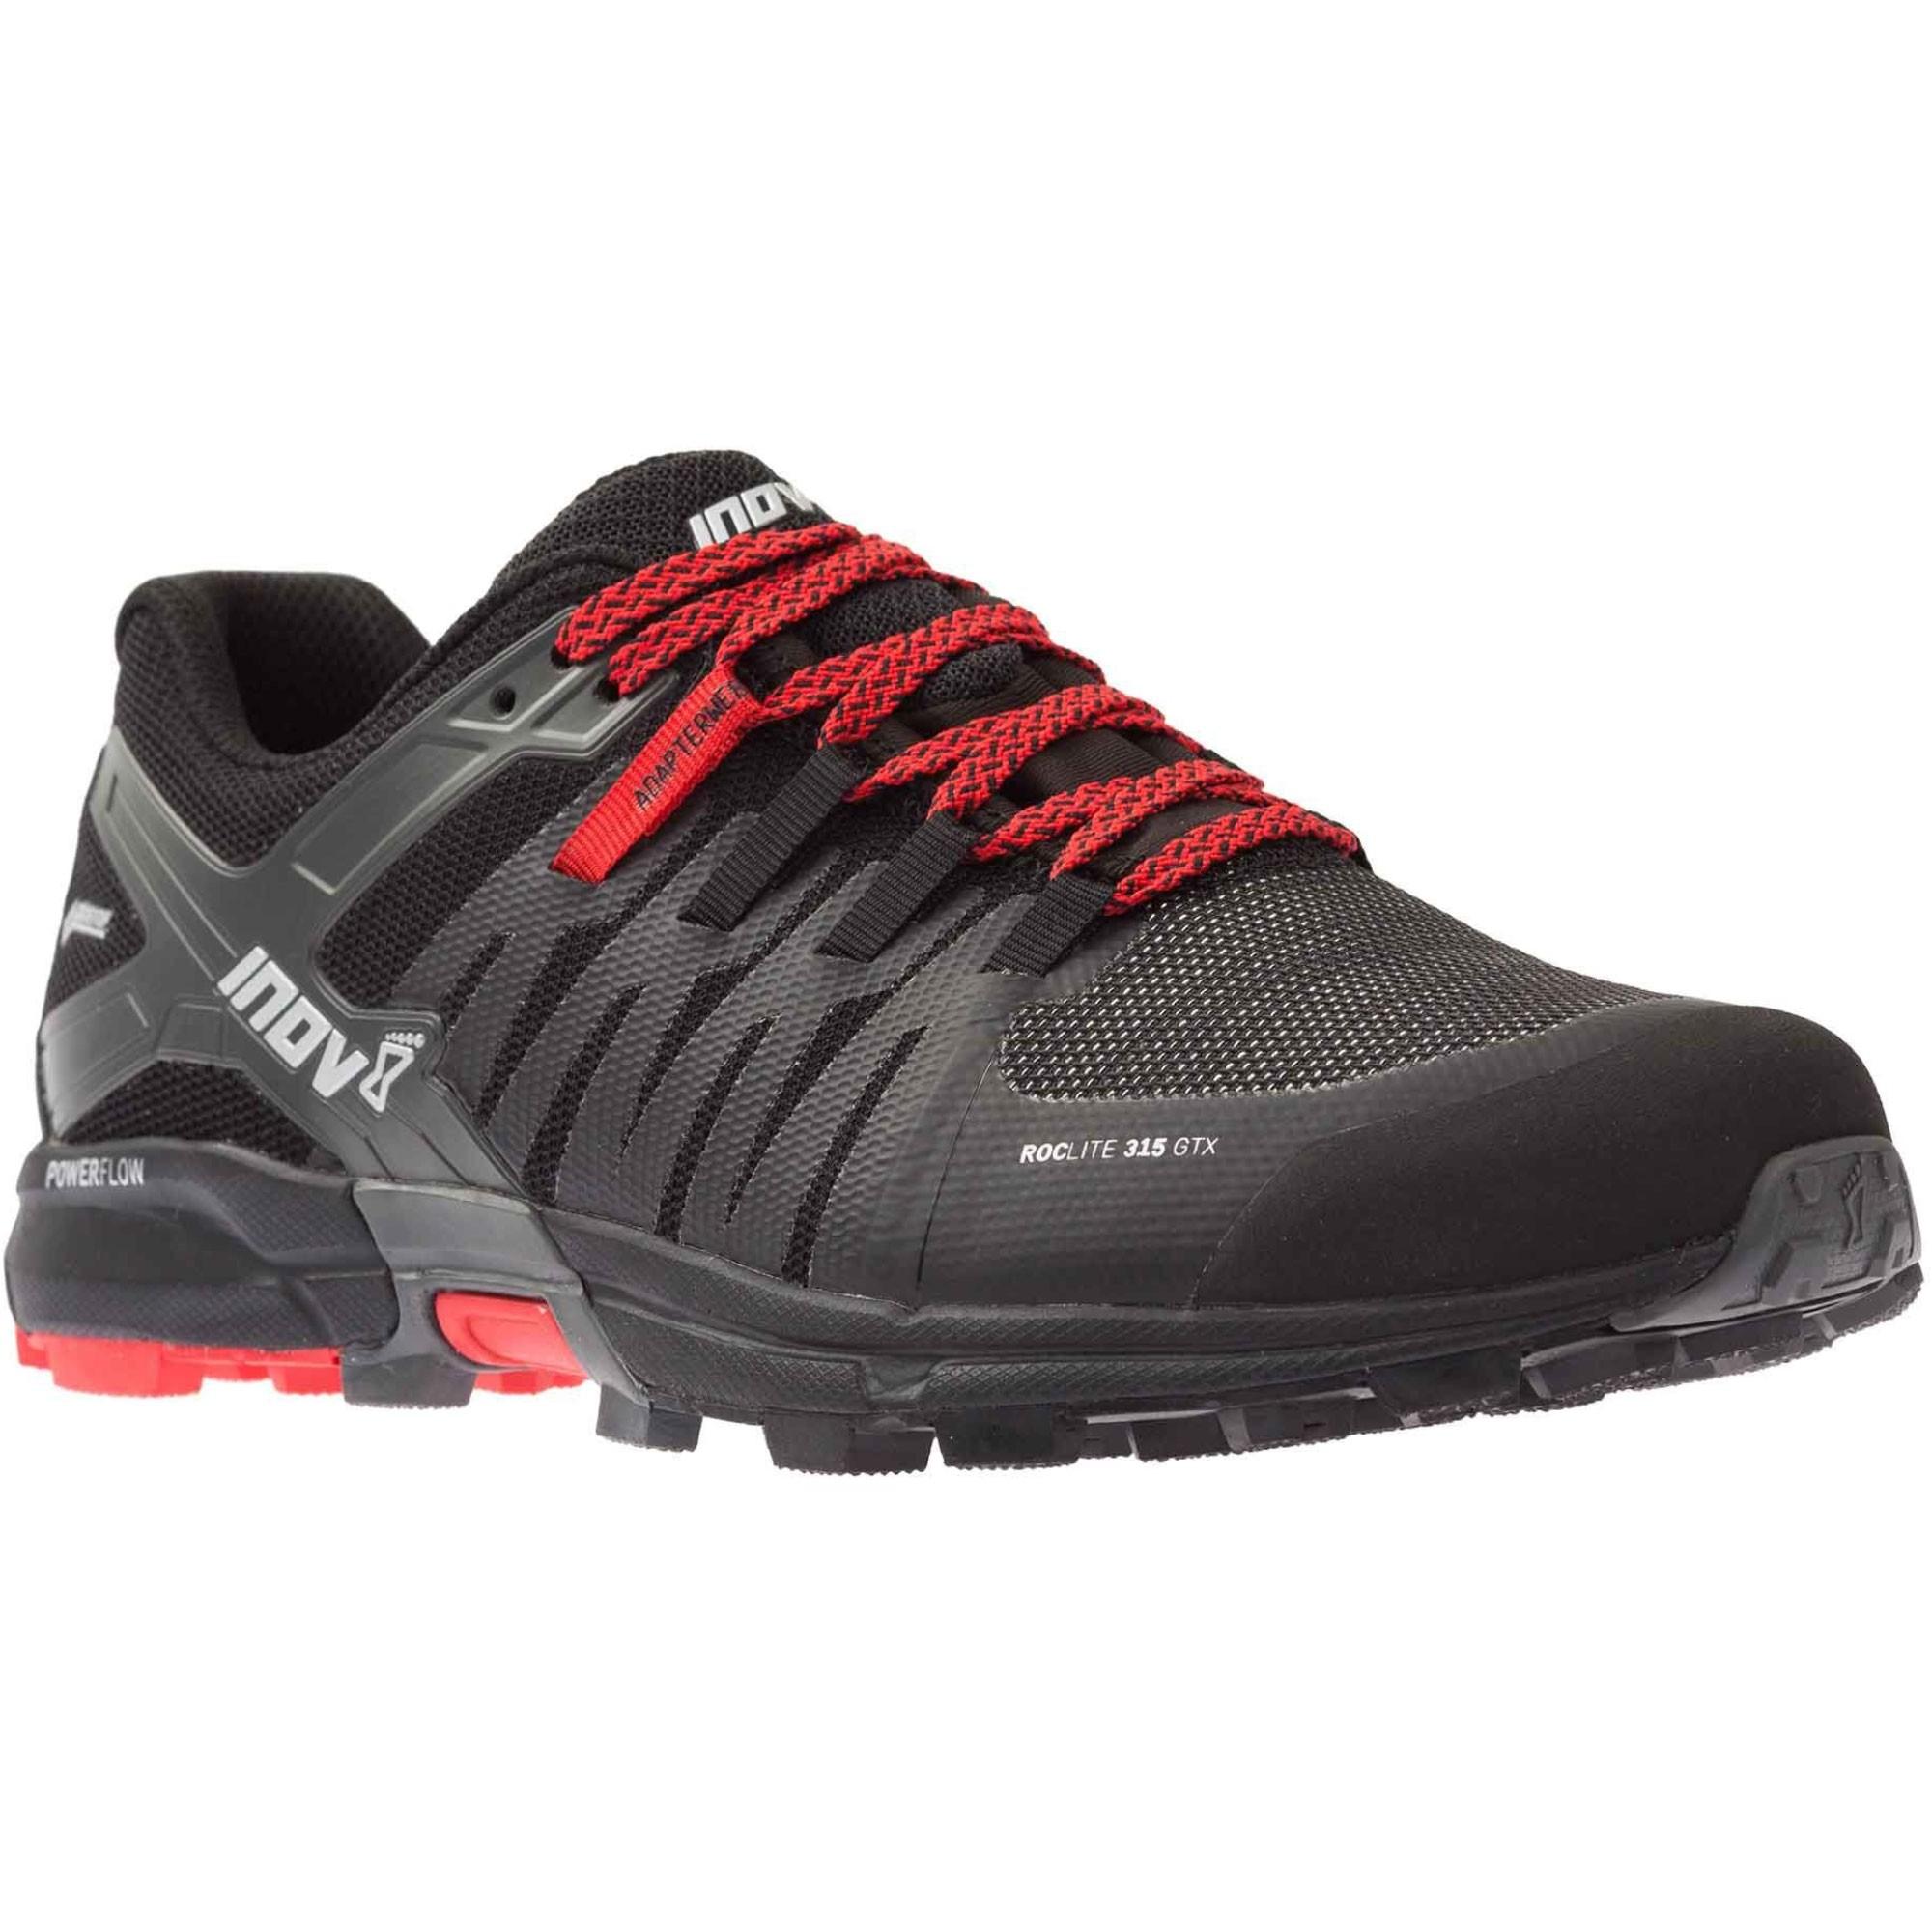 INOV8 Roclite 315 GTX Waterproof Running Shoes - Black/Red